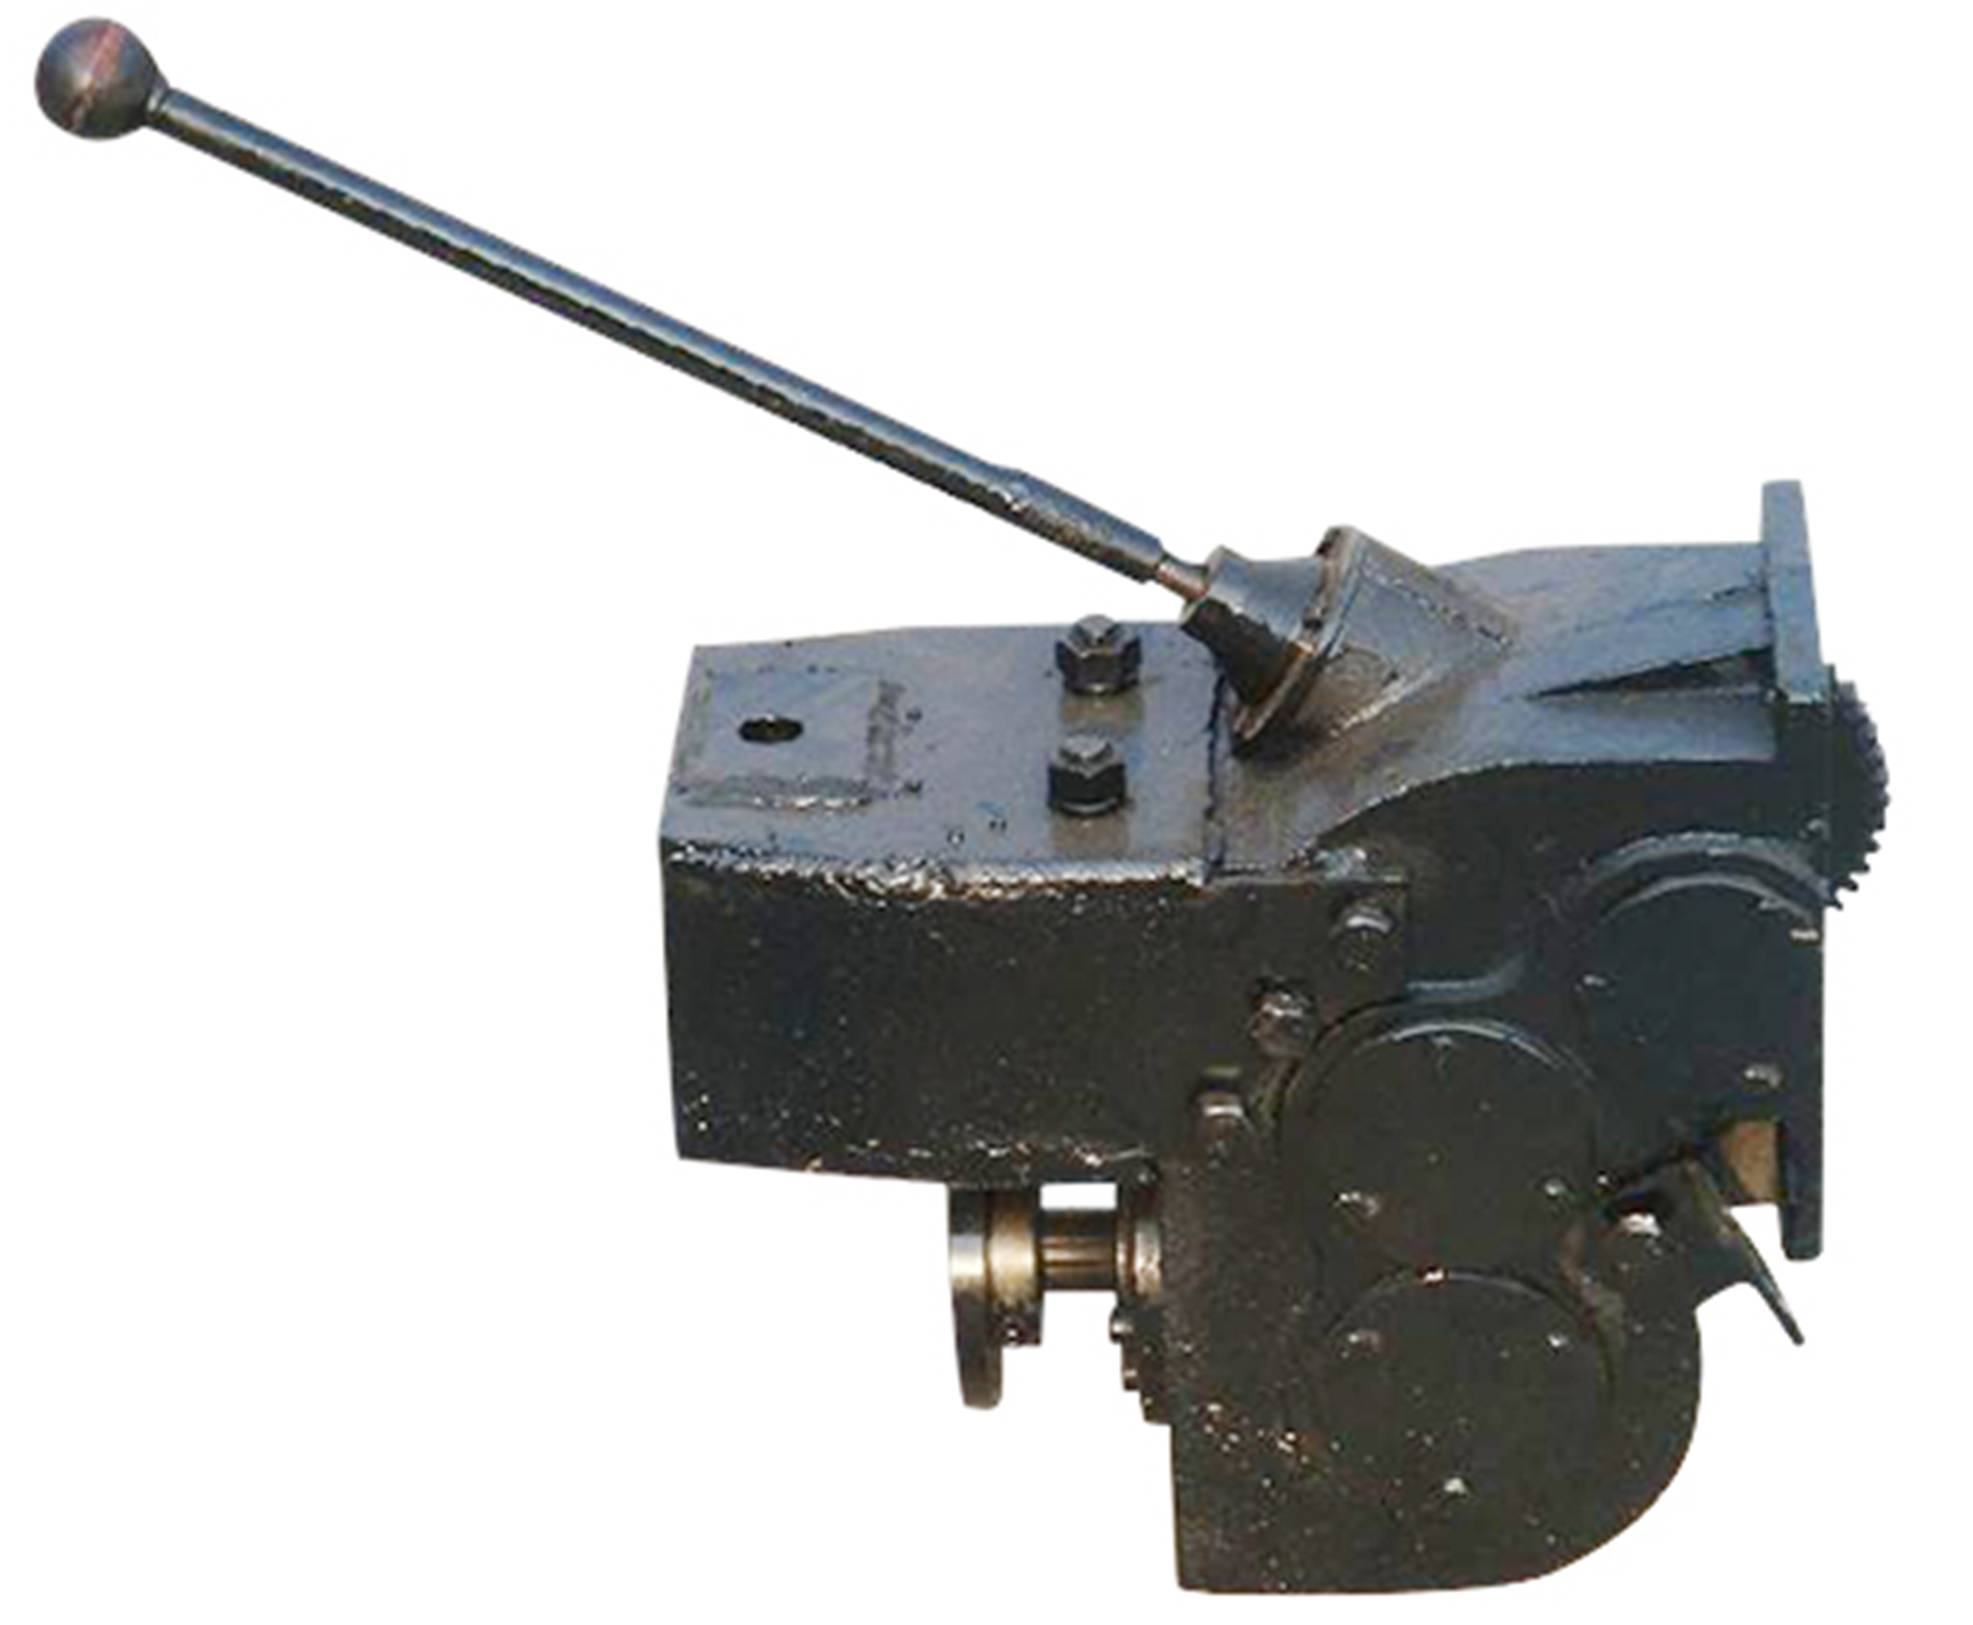 yuy-nj33工农12型手扶拖拉机变速箱带拆装翻转系统|农业机械教学设备图片